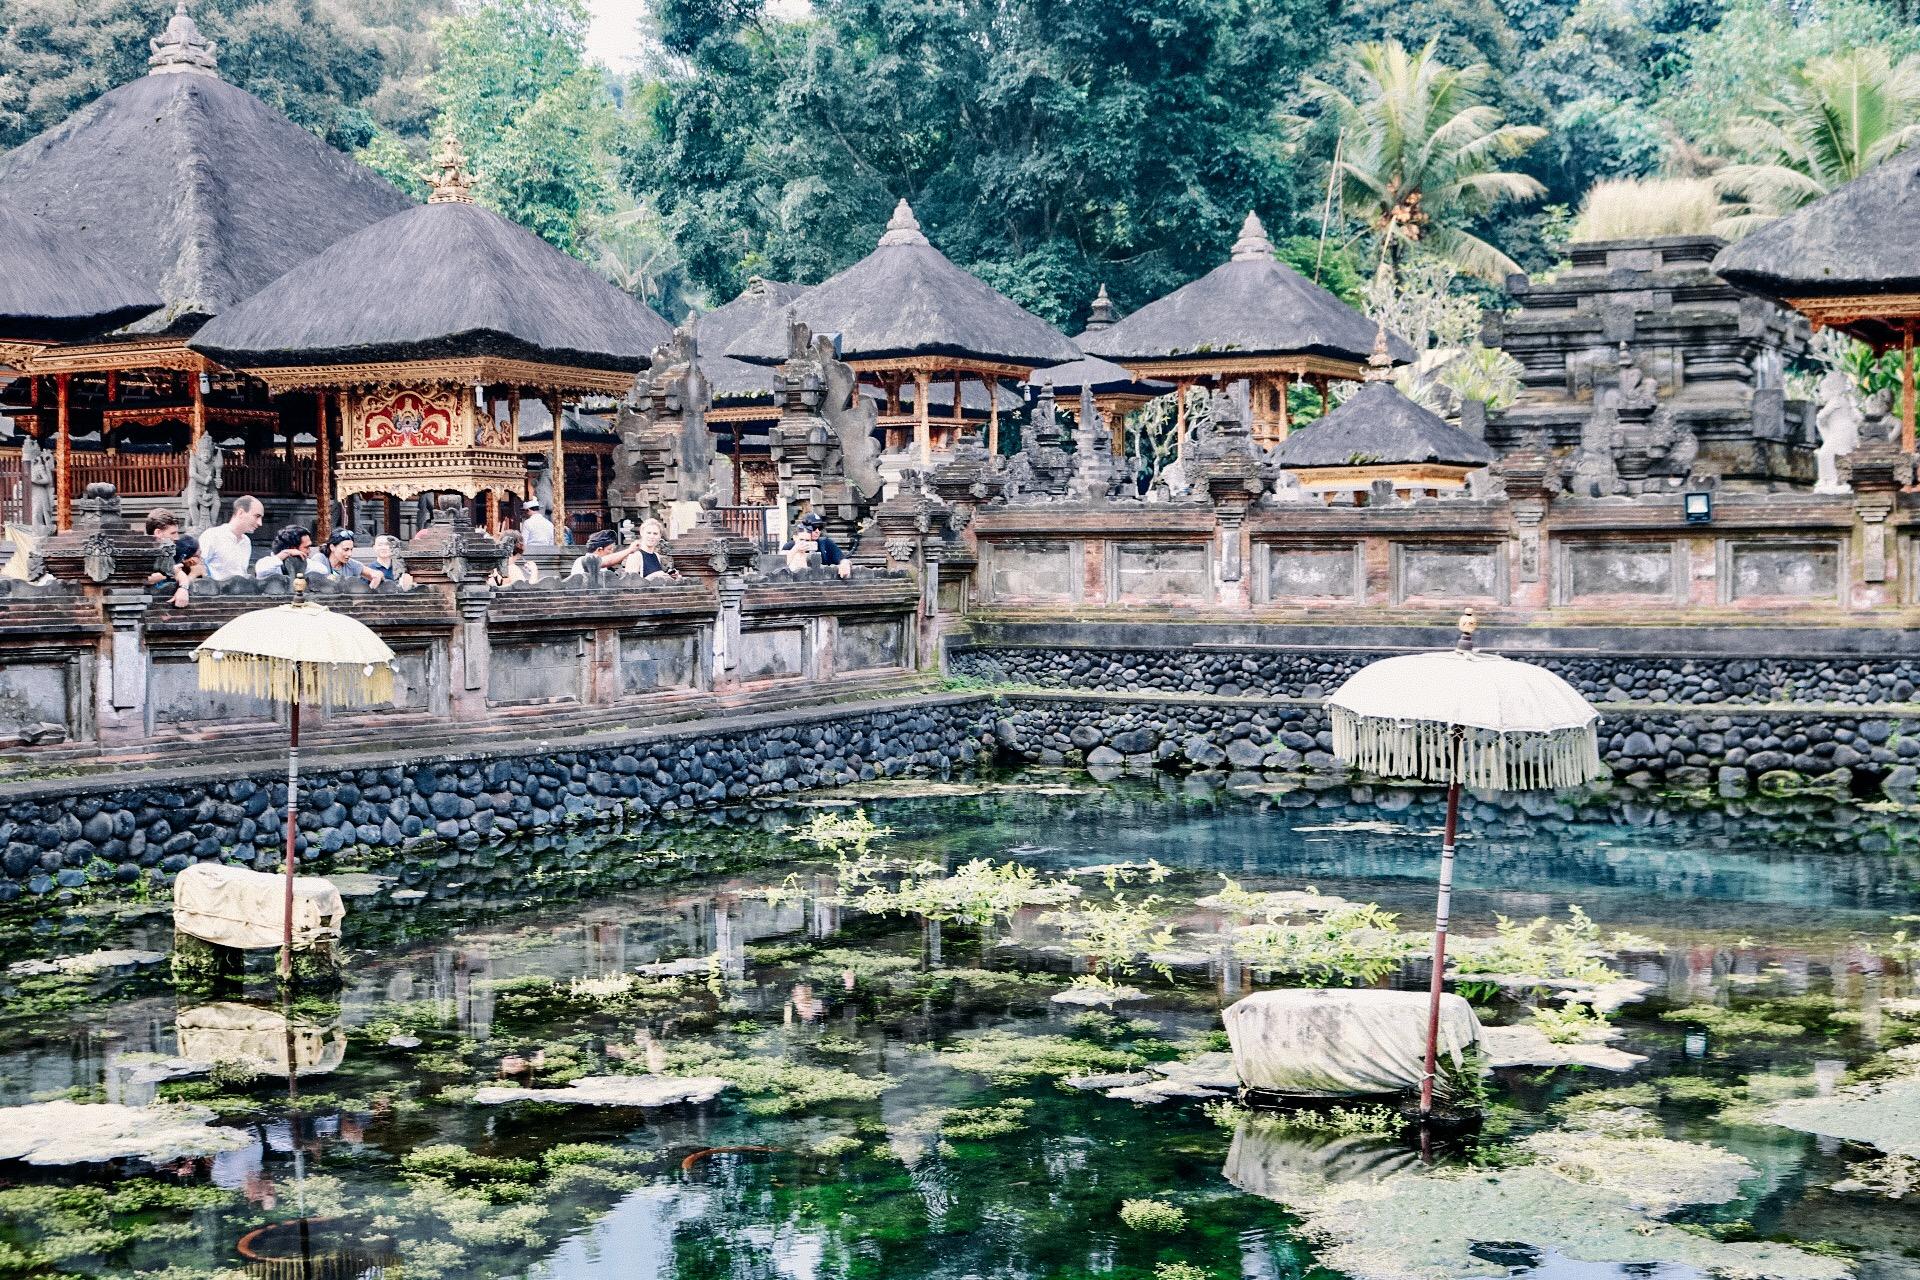 Pura Tirta Empul Holy Water temple travel guide